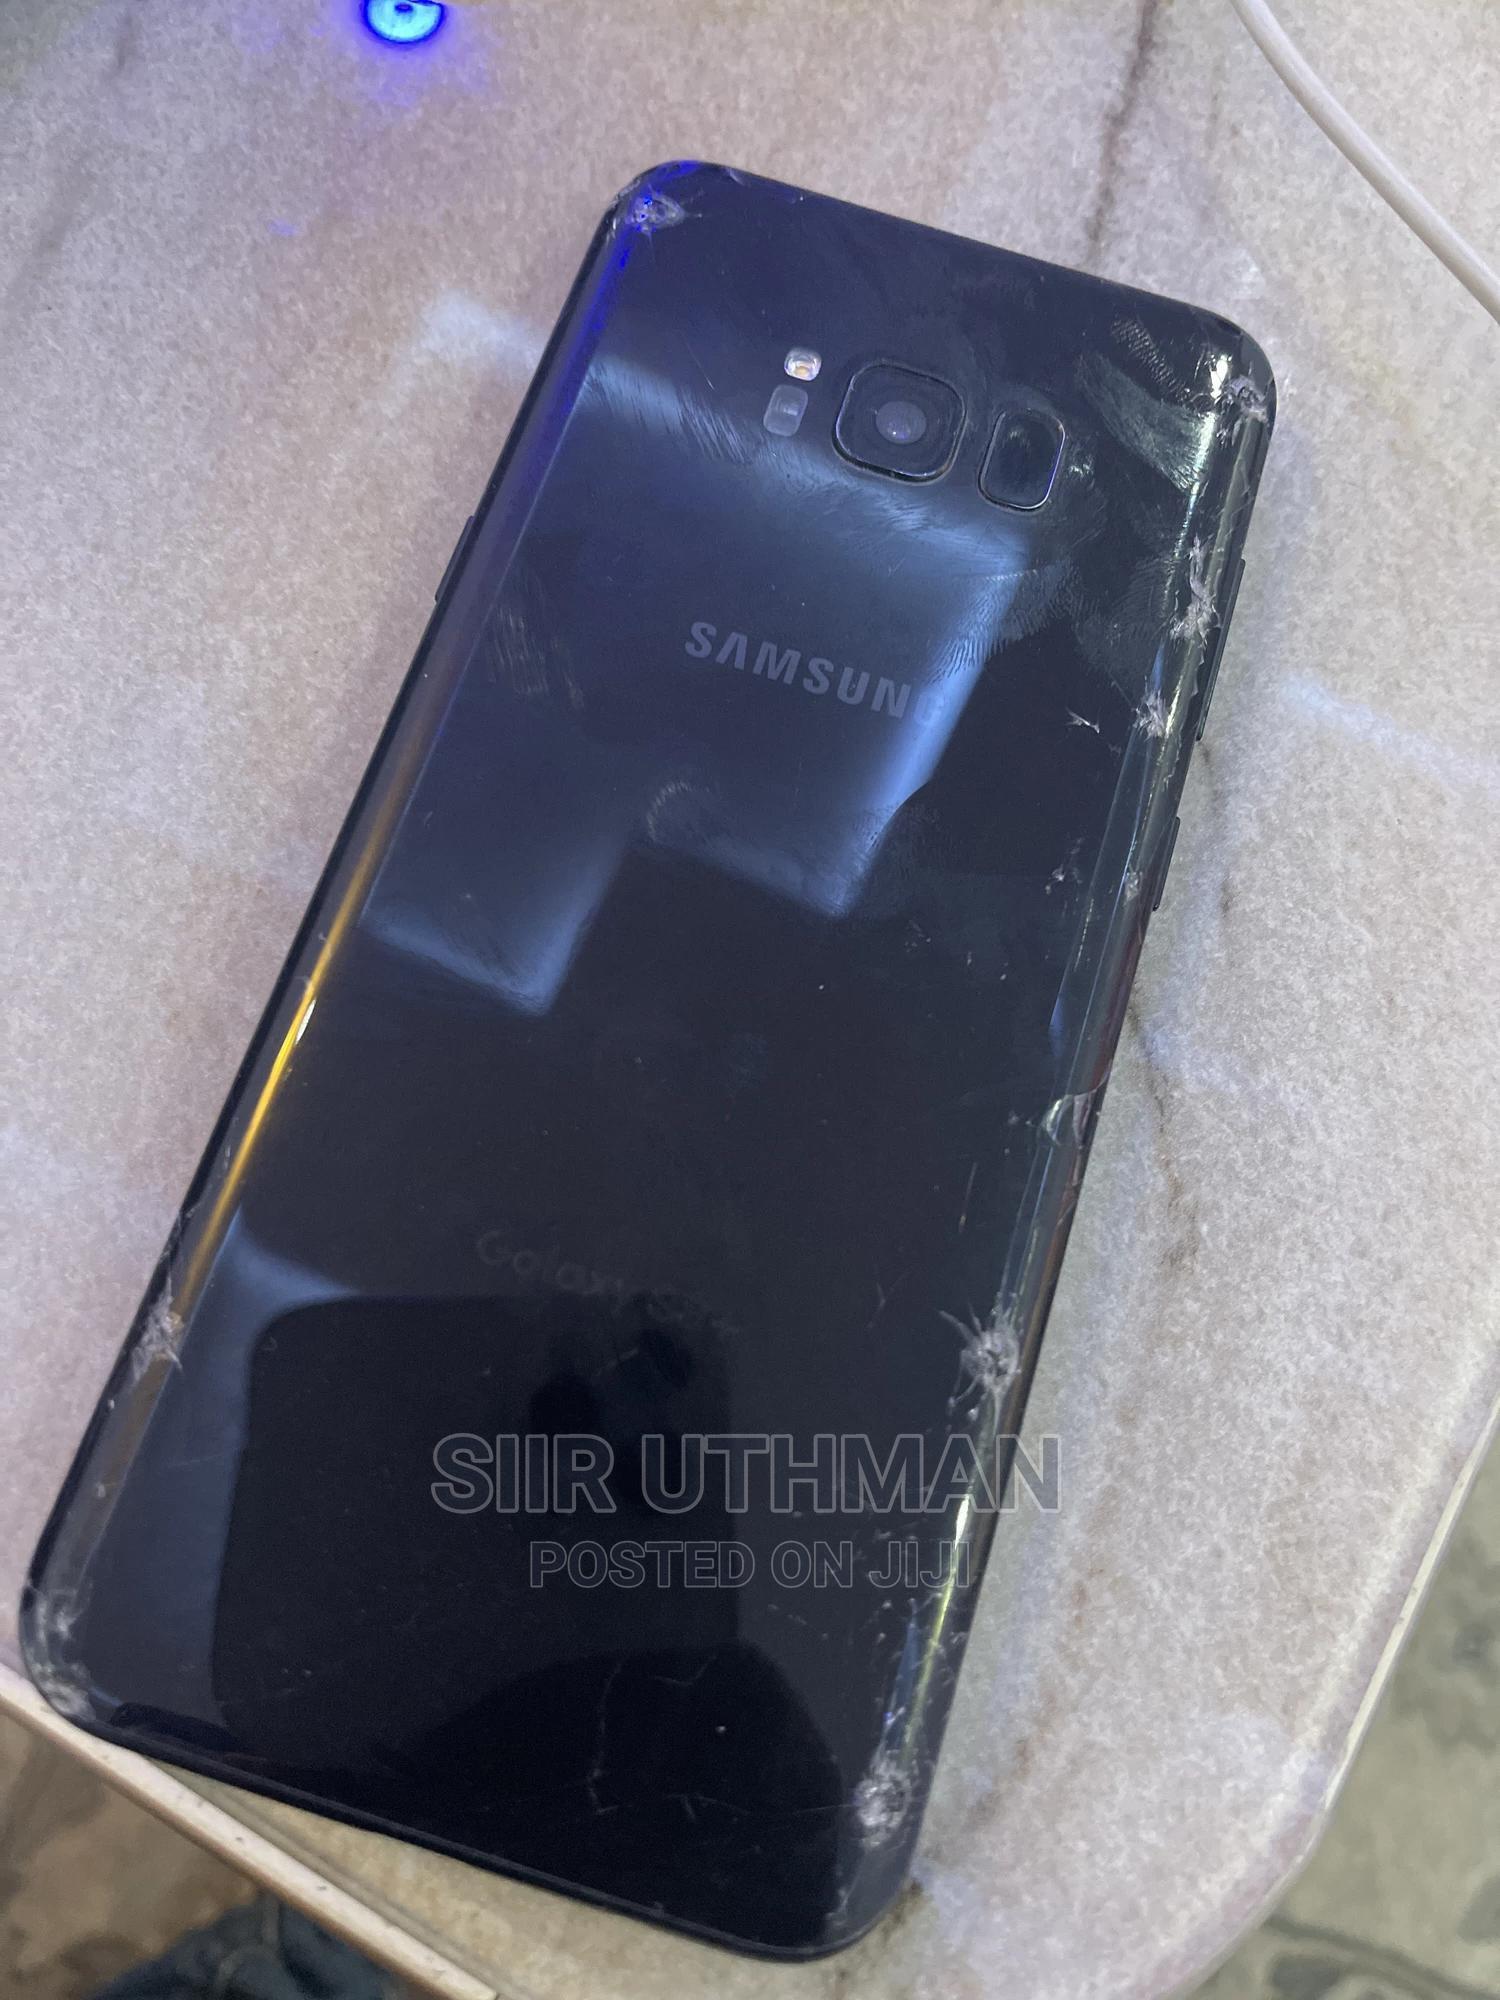 Archive: Samsung Galaxy S8 Plus 128 GB Black